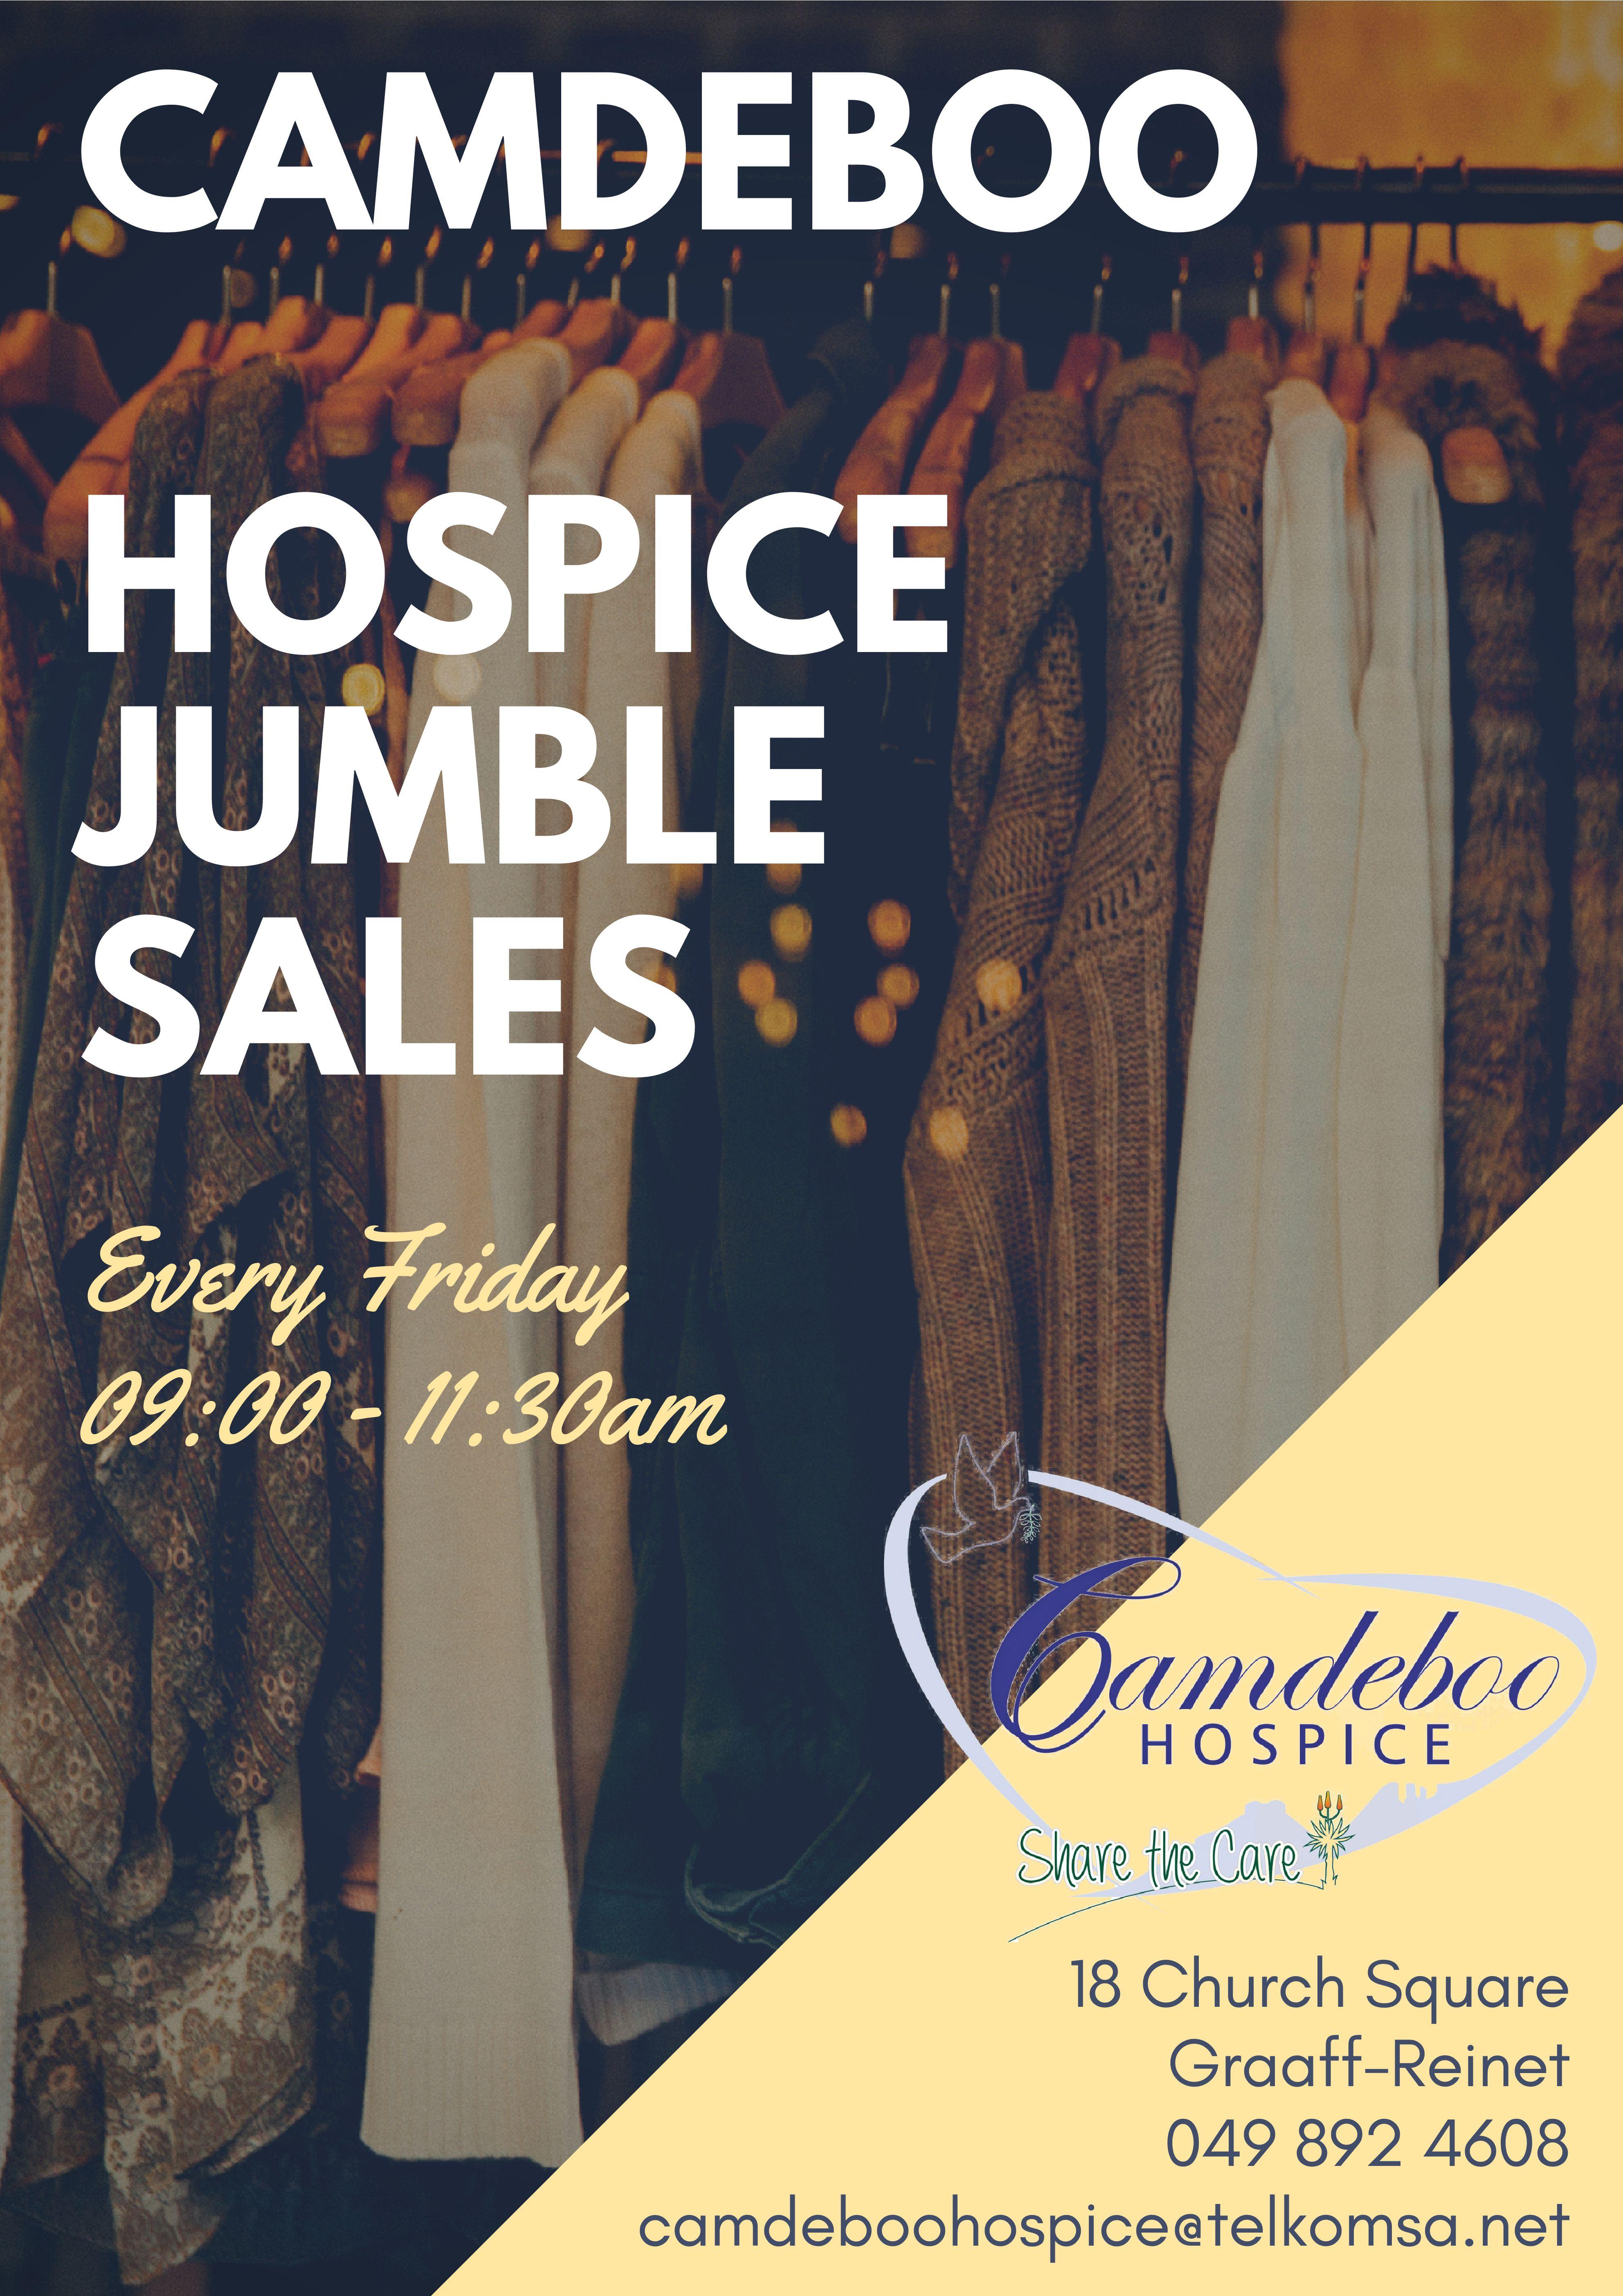 Camdeboo hospice jumble sales (2)